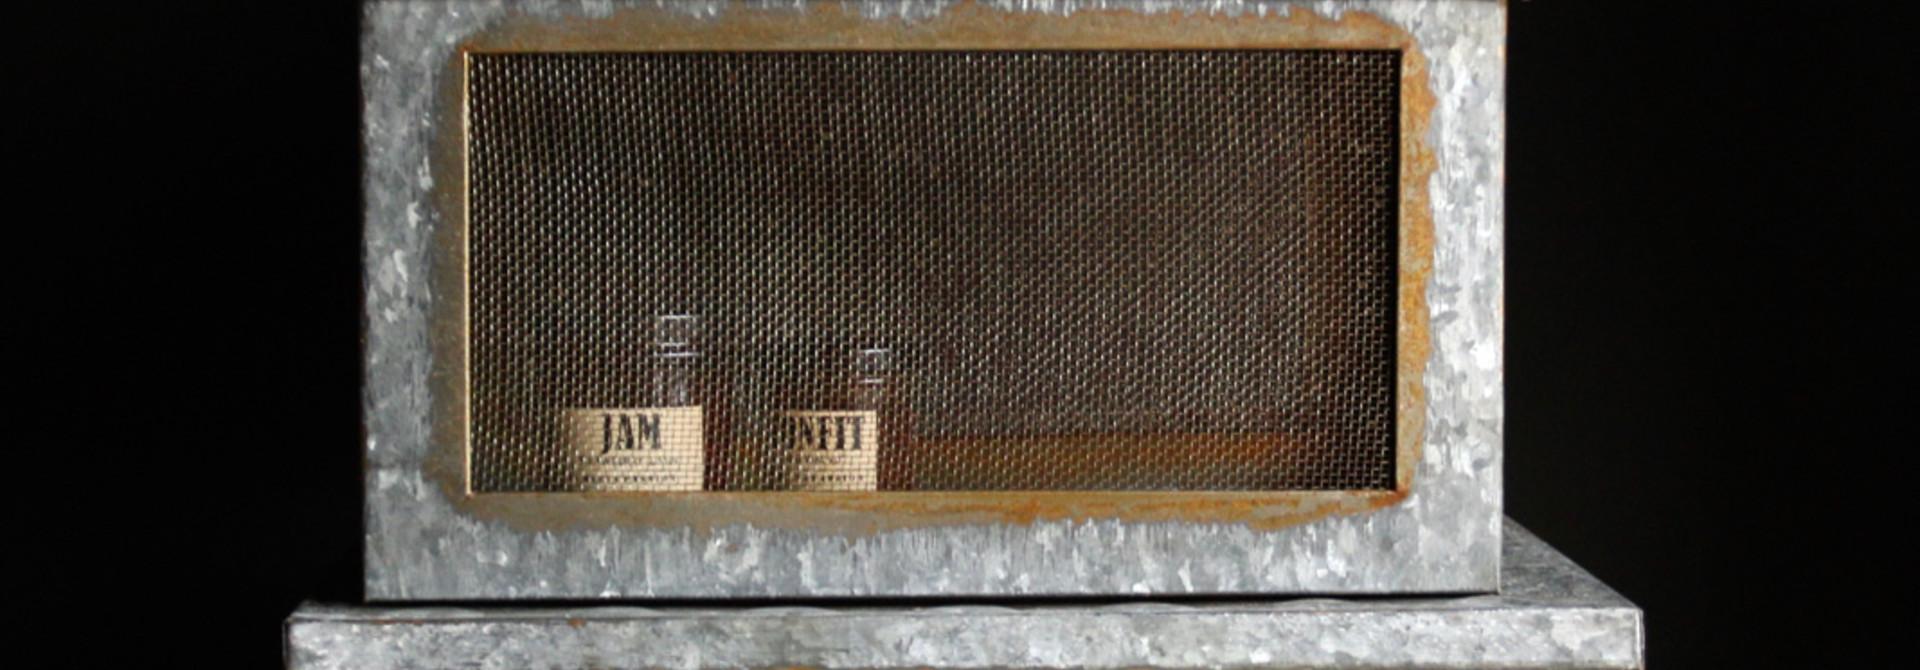 Zinc box with mesh